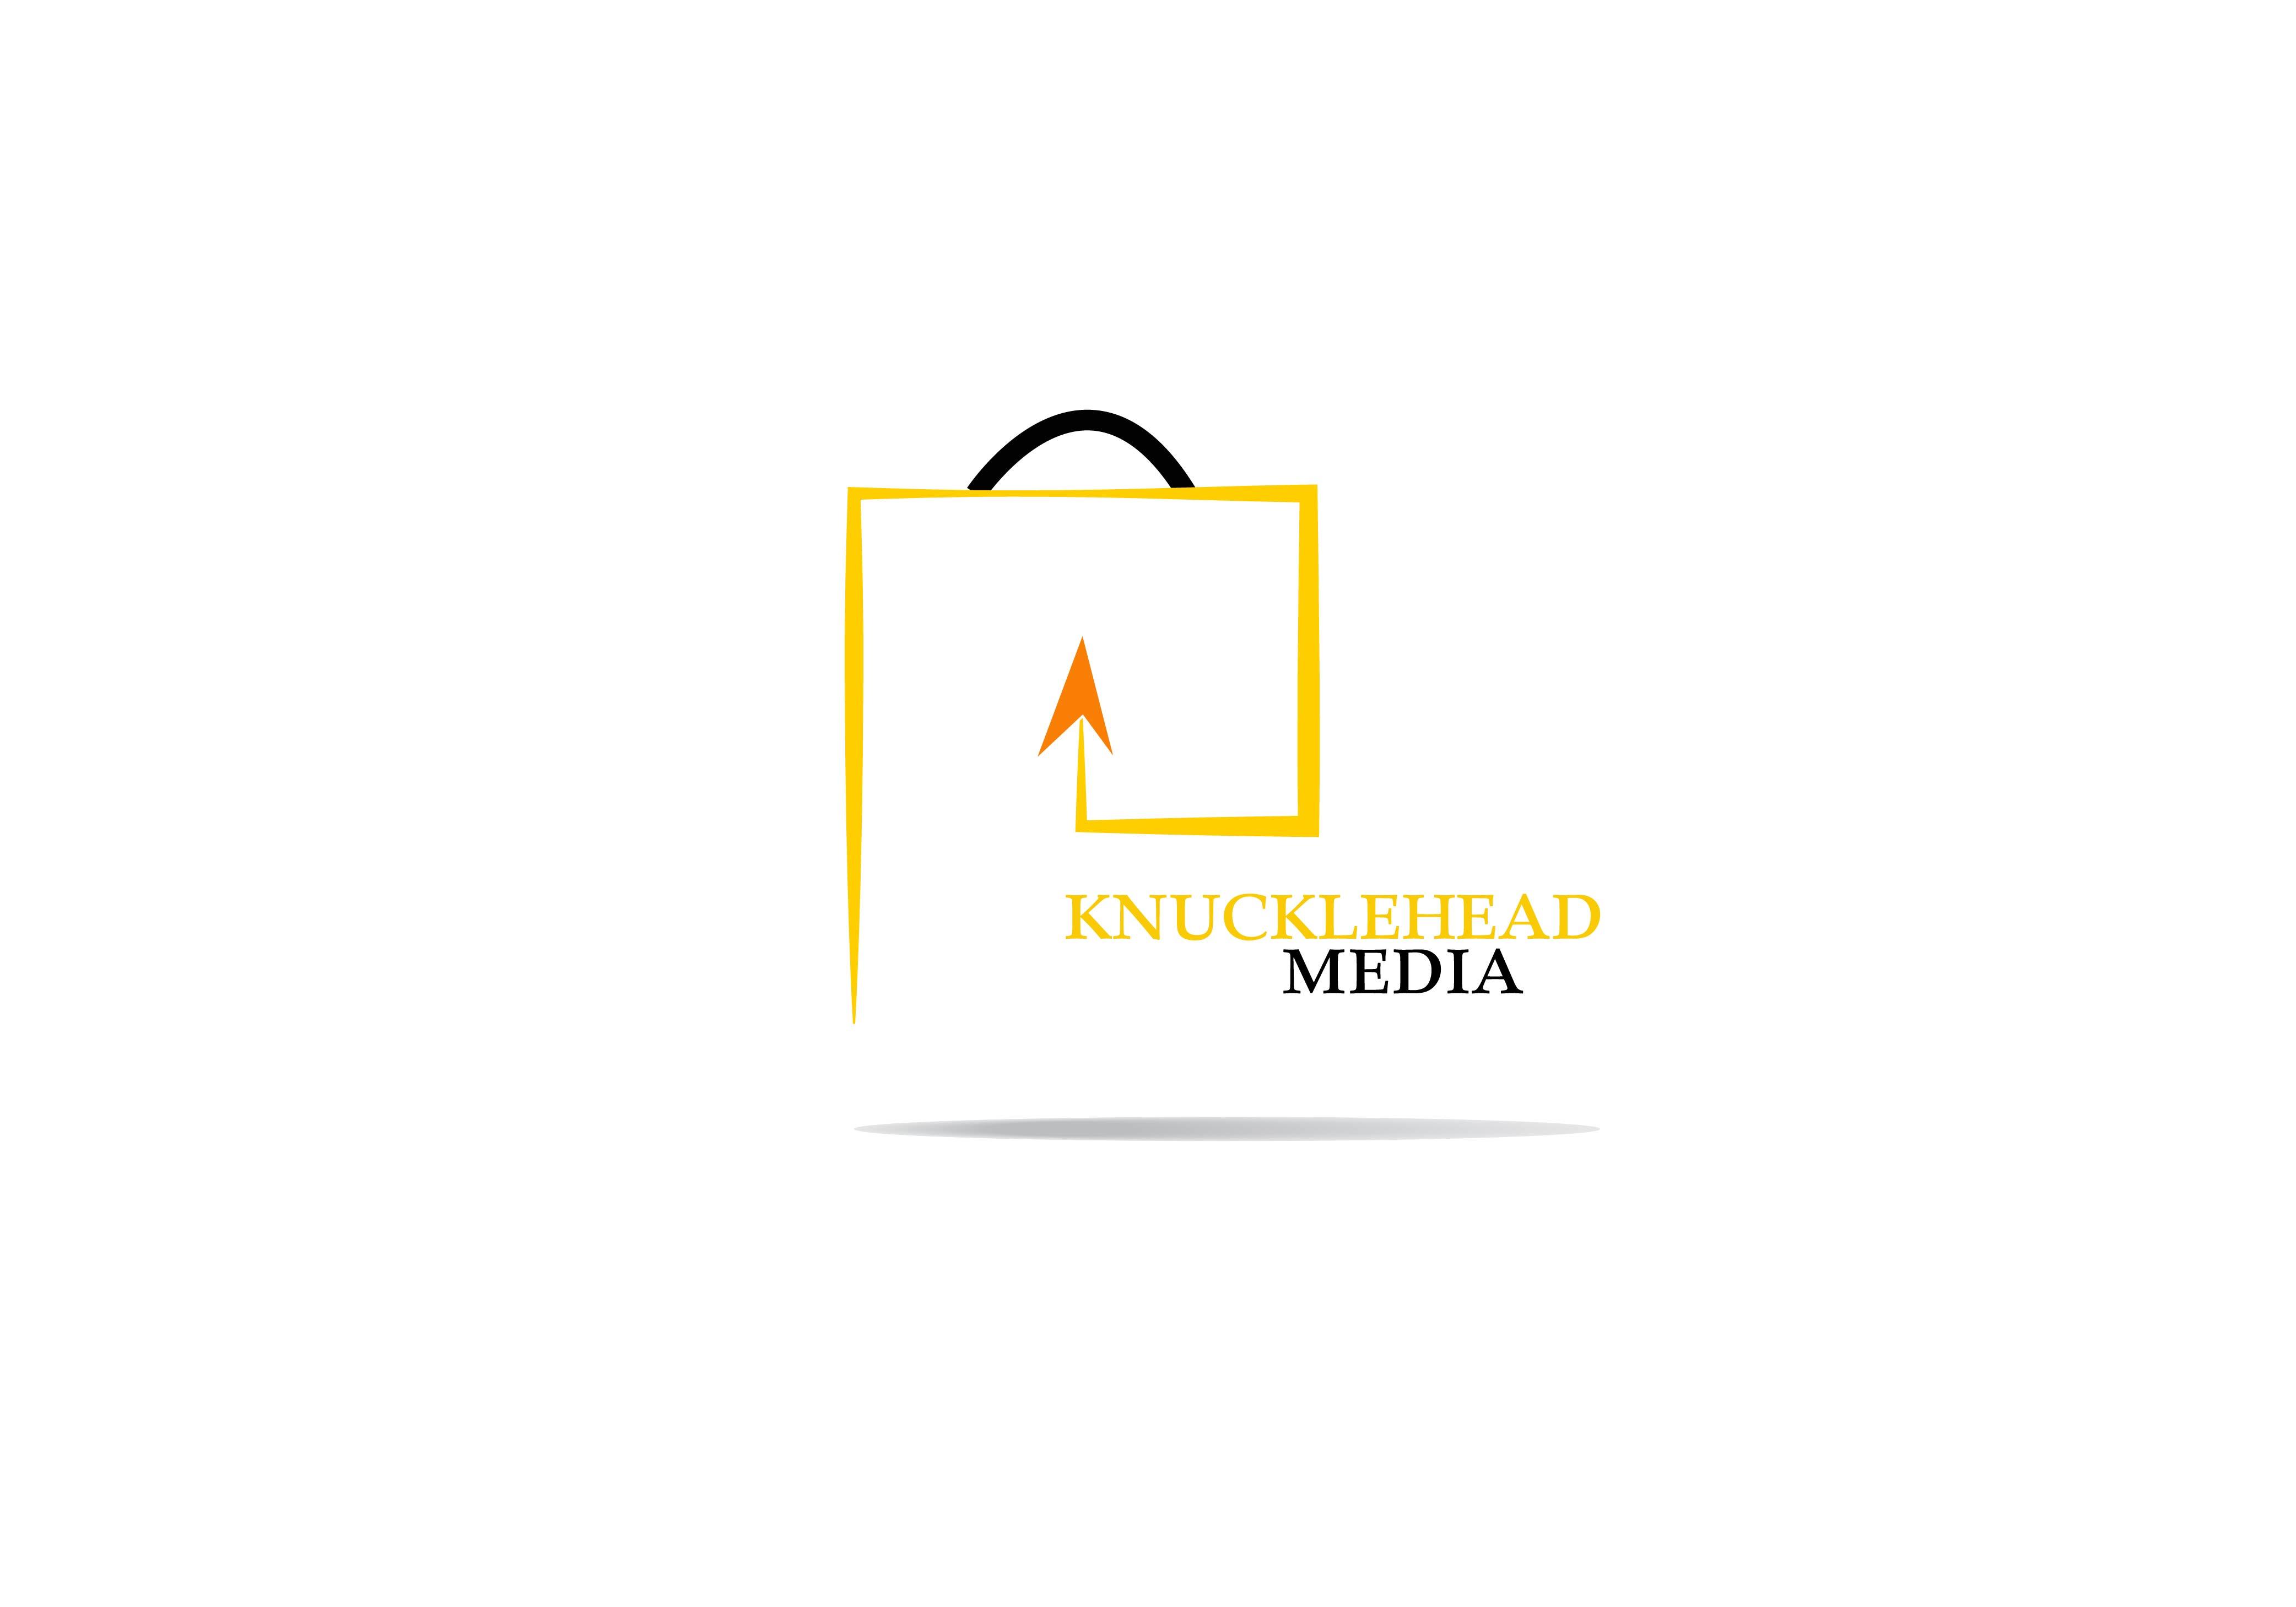 Logo Design by Bilal Baloch - Entry No. 35 in the Logo Design Contest Imaginative Logo Design for knucklehead media.